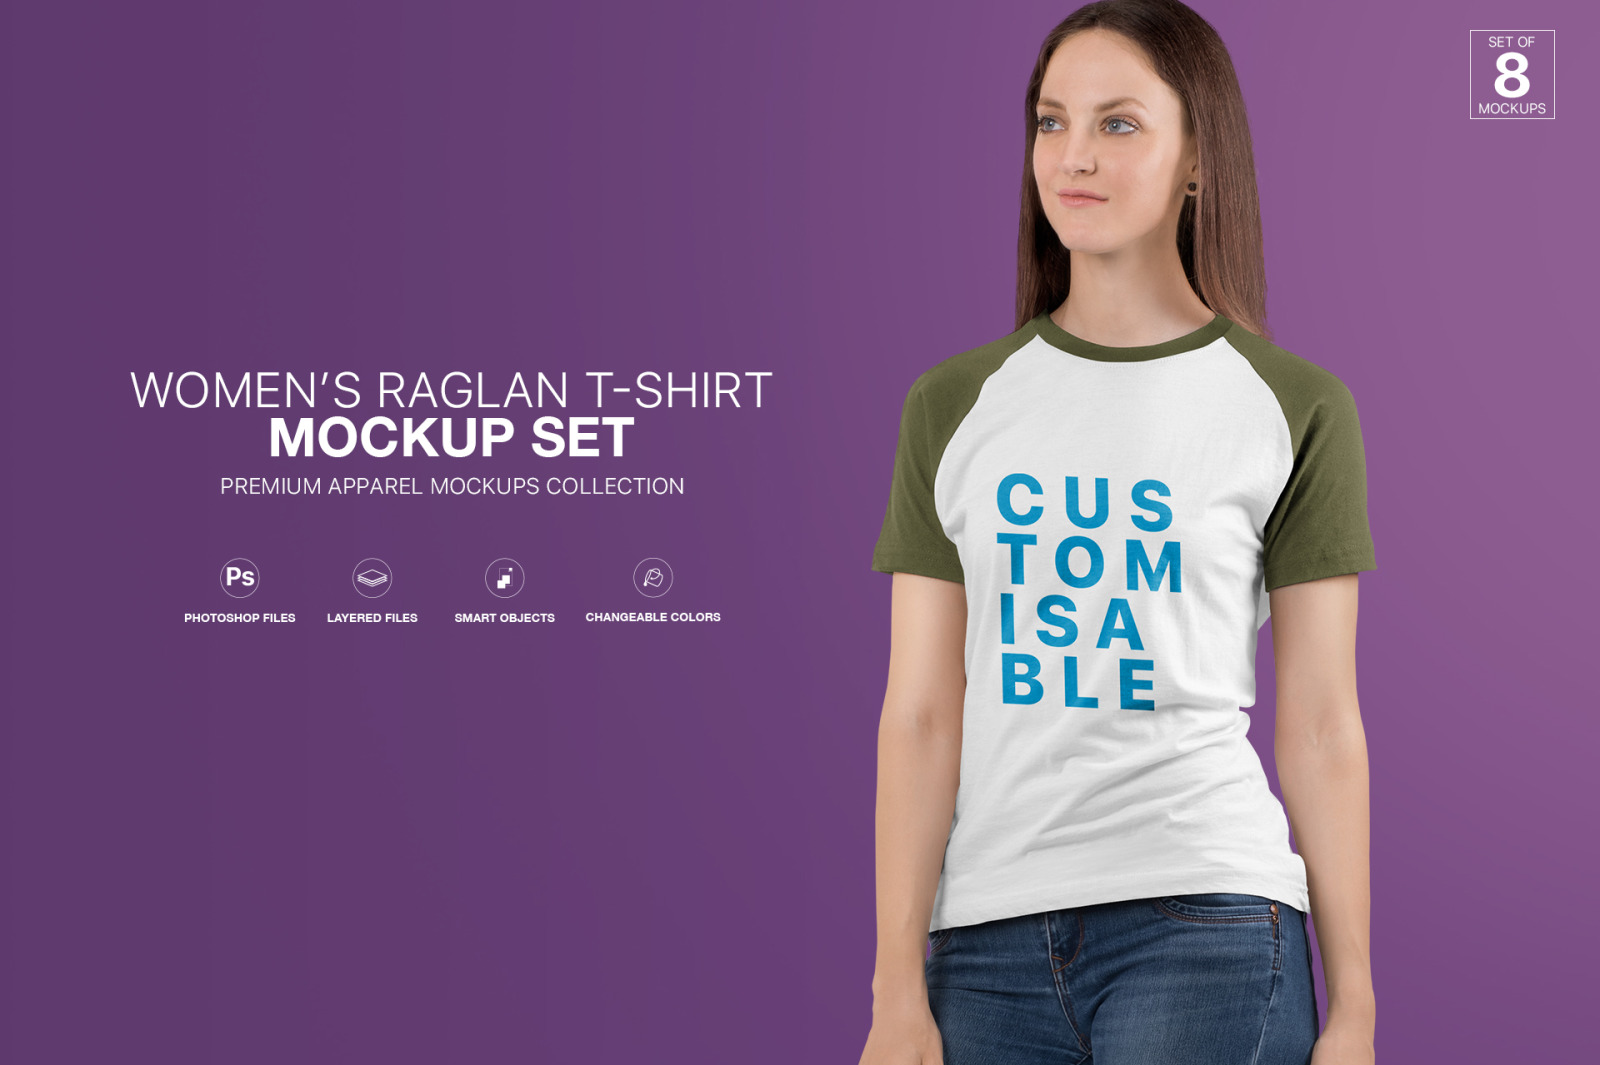 Download Women S Raglan T Shirt Mockup Set In Apparel Mockups On Yellow Images Creative Store PSD Mockup Templates